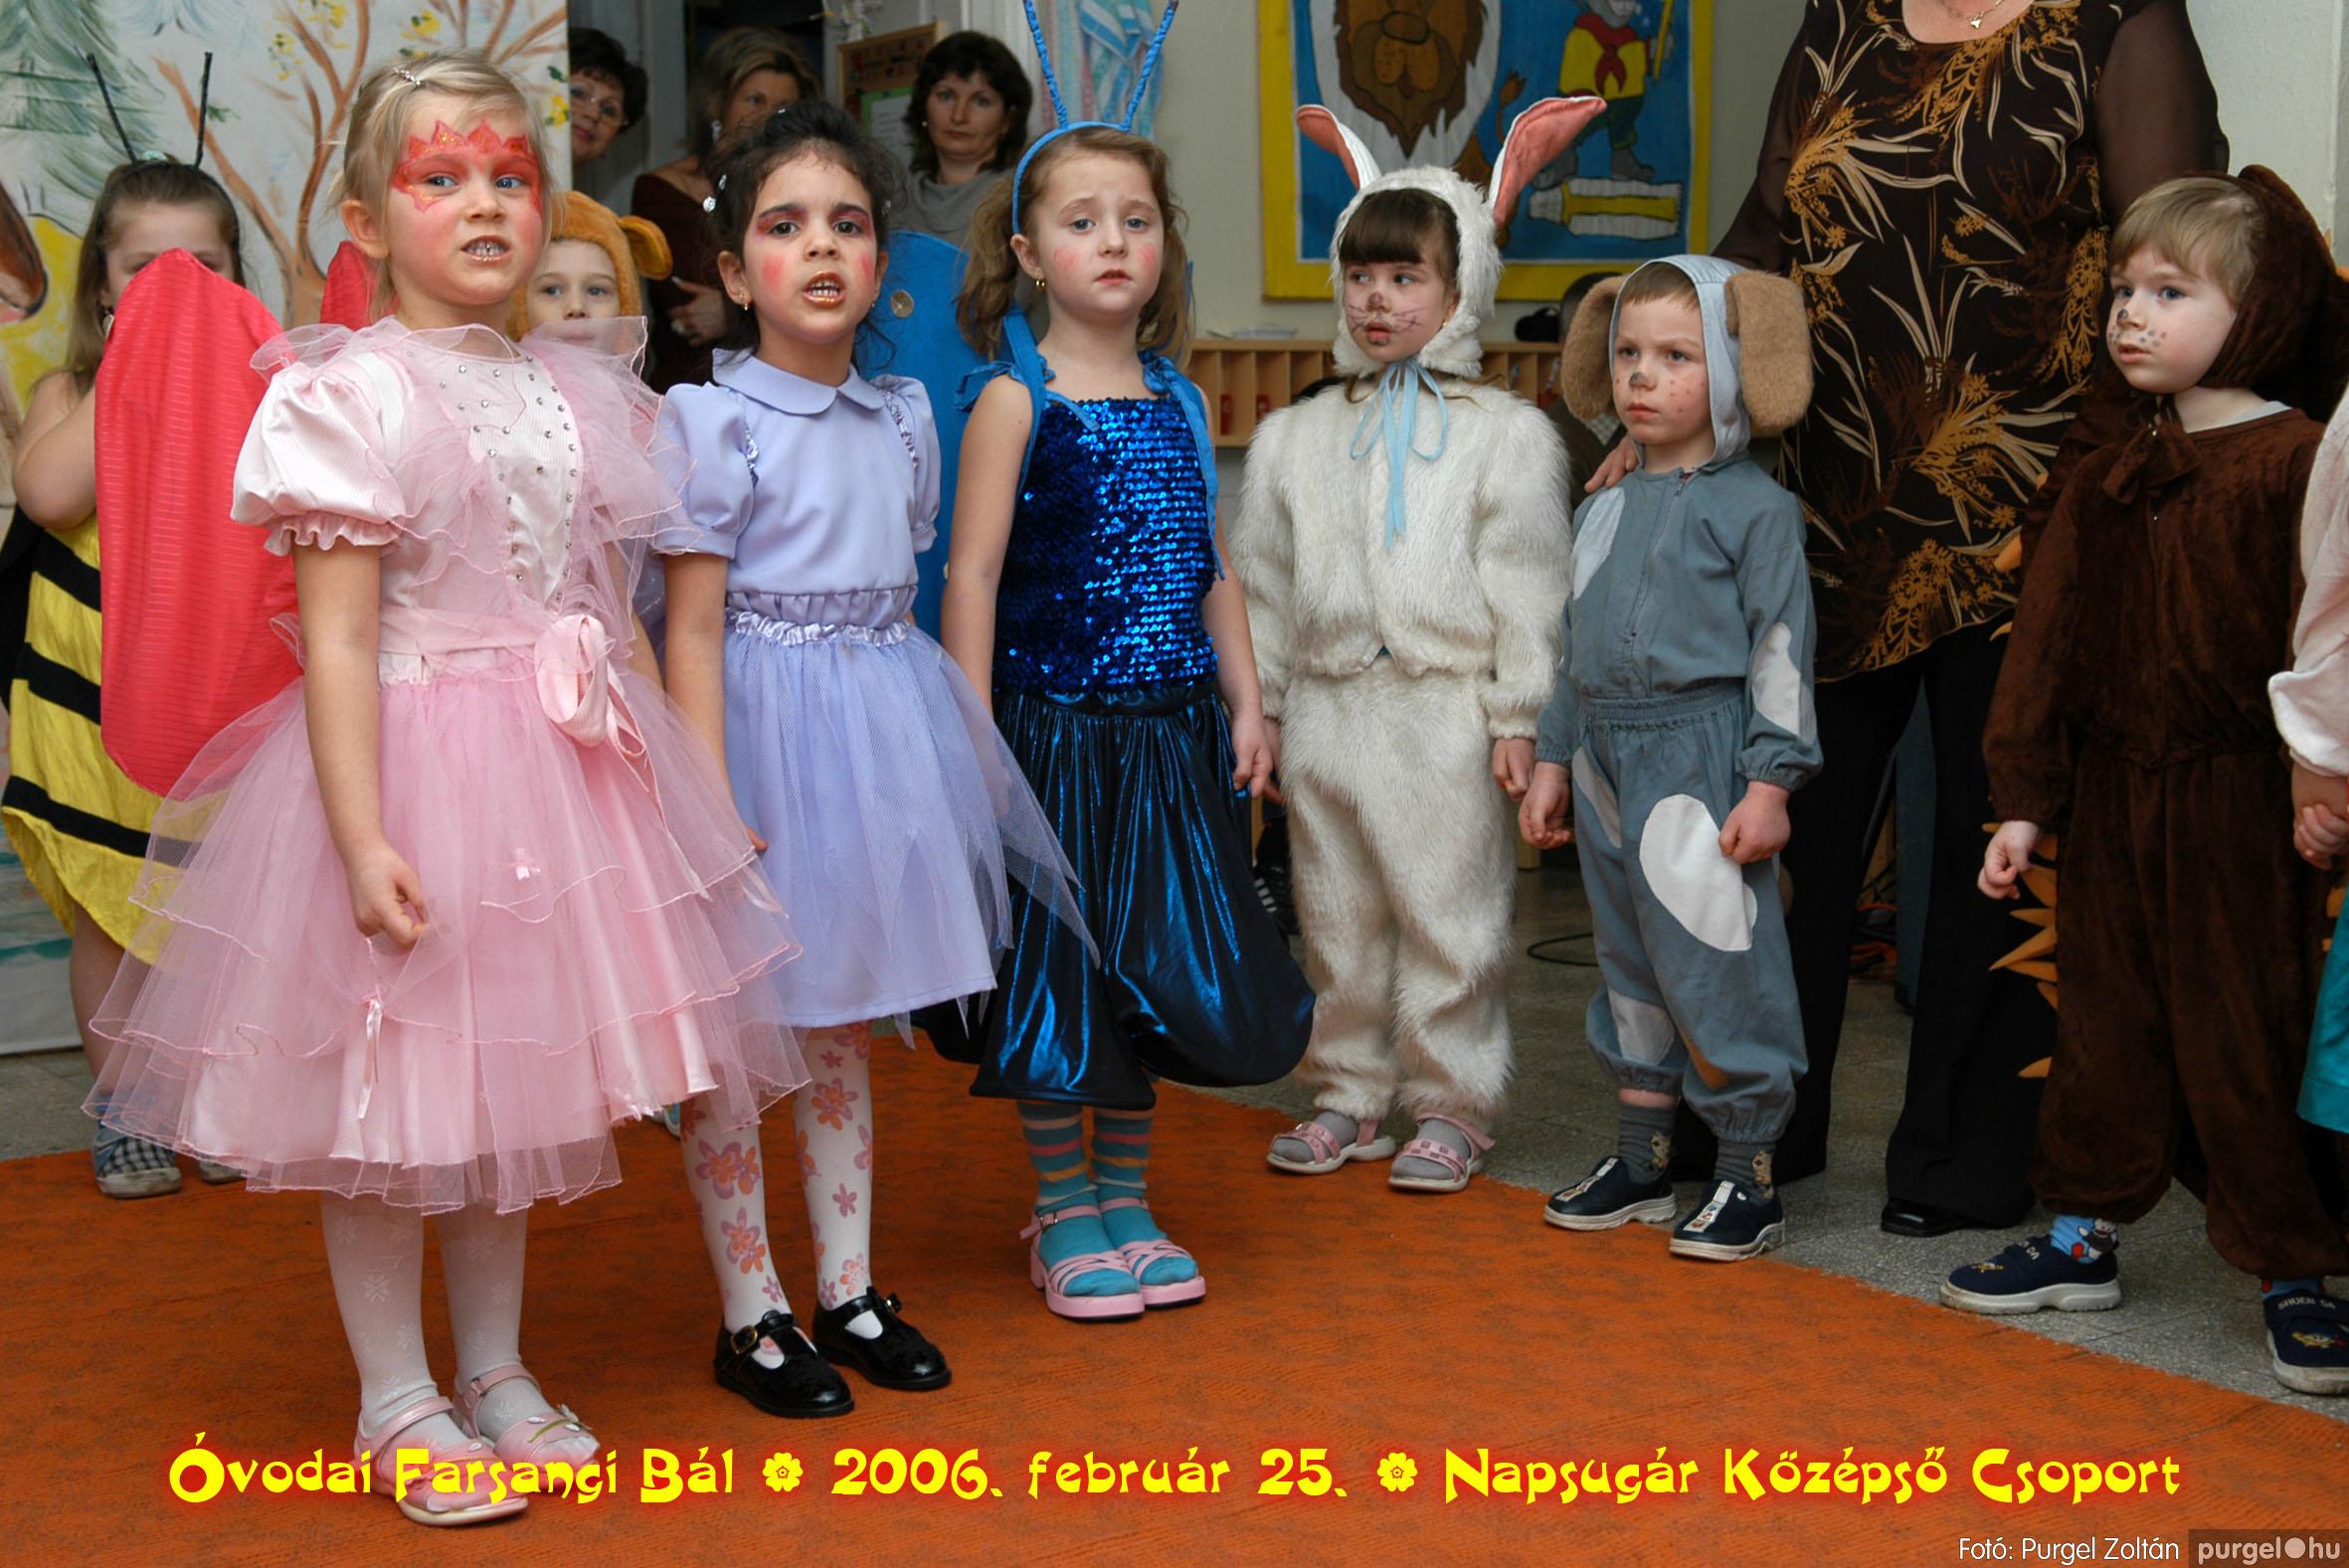 2006.02.25. 216 Kurca-parti Óvoda farsang 2006. - Napsugár csoport - Fotó:PURGEL ZOLTÁN©.jpg